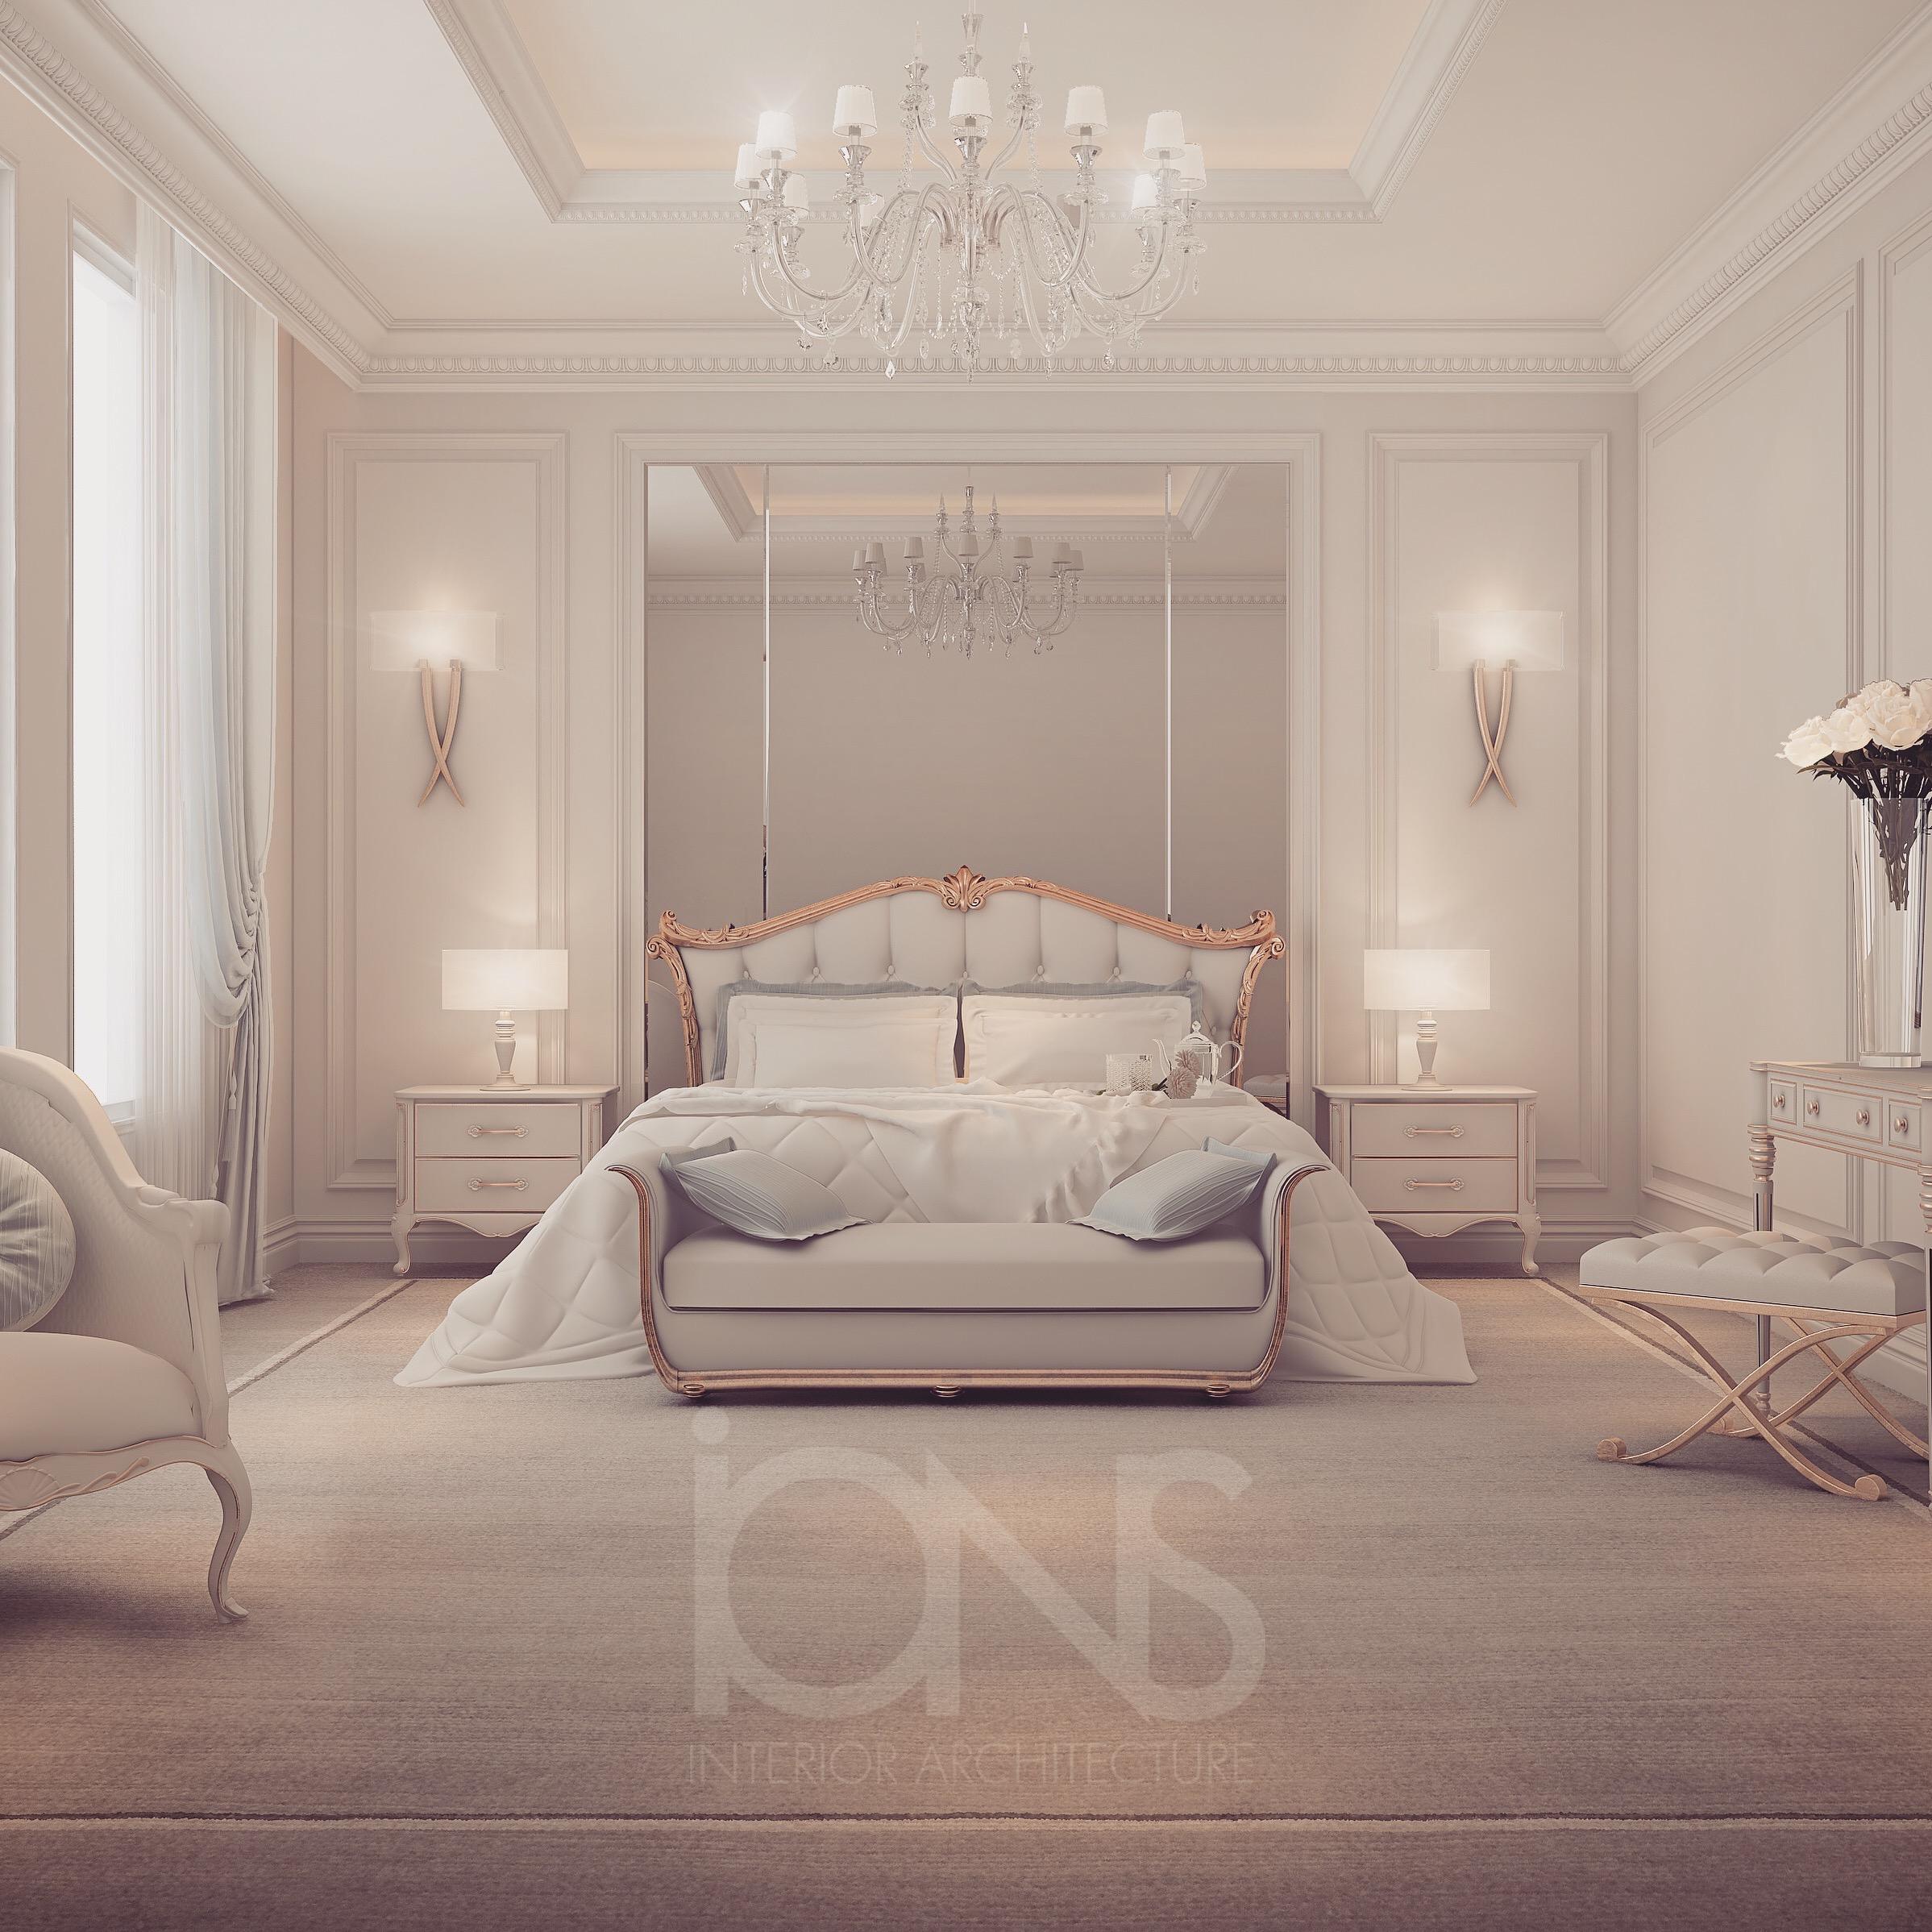 Bedroom Interior Design -Dubai